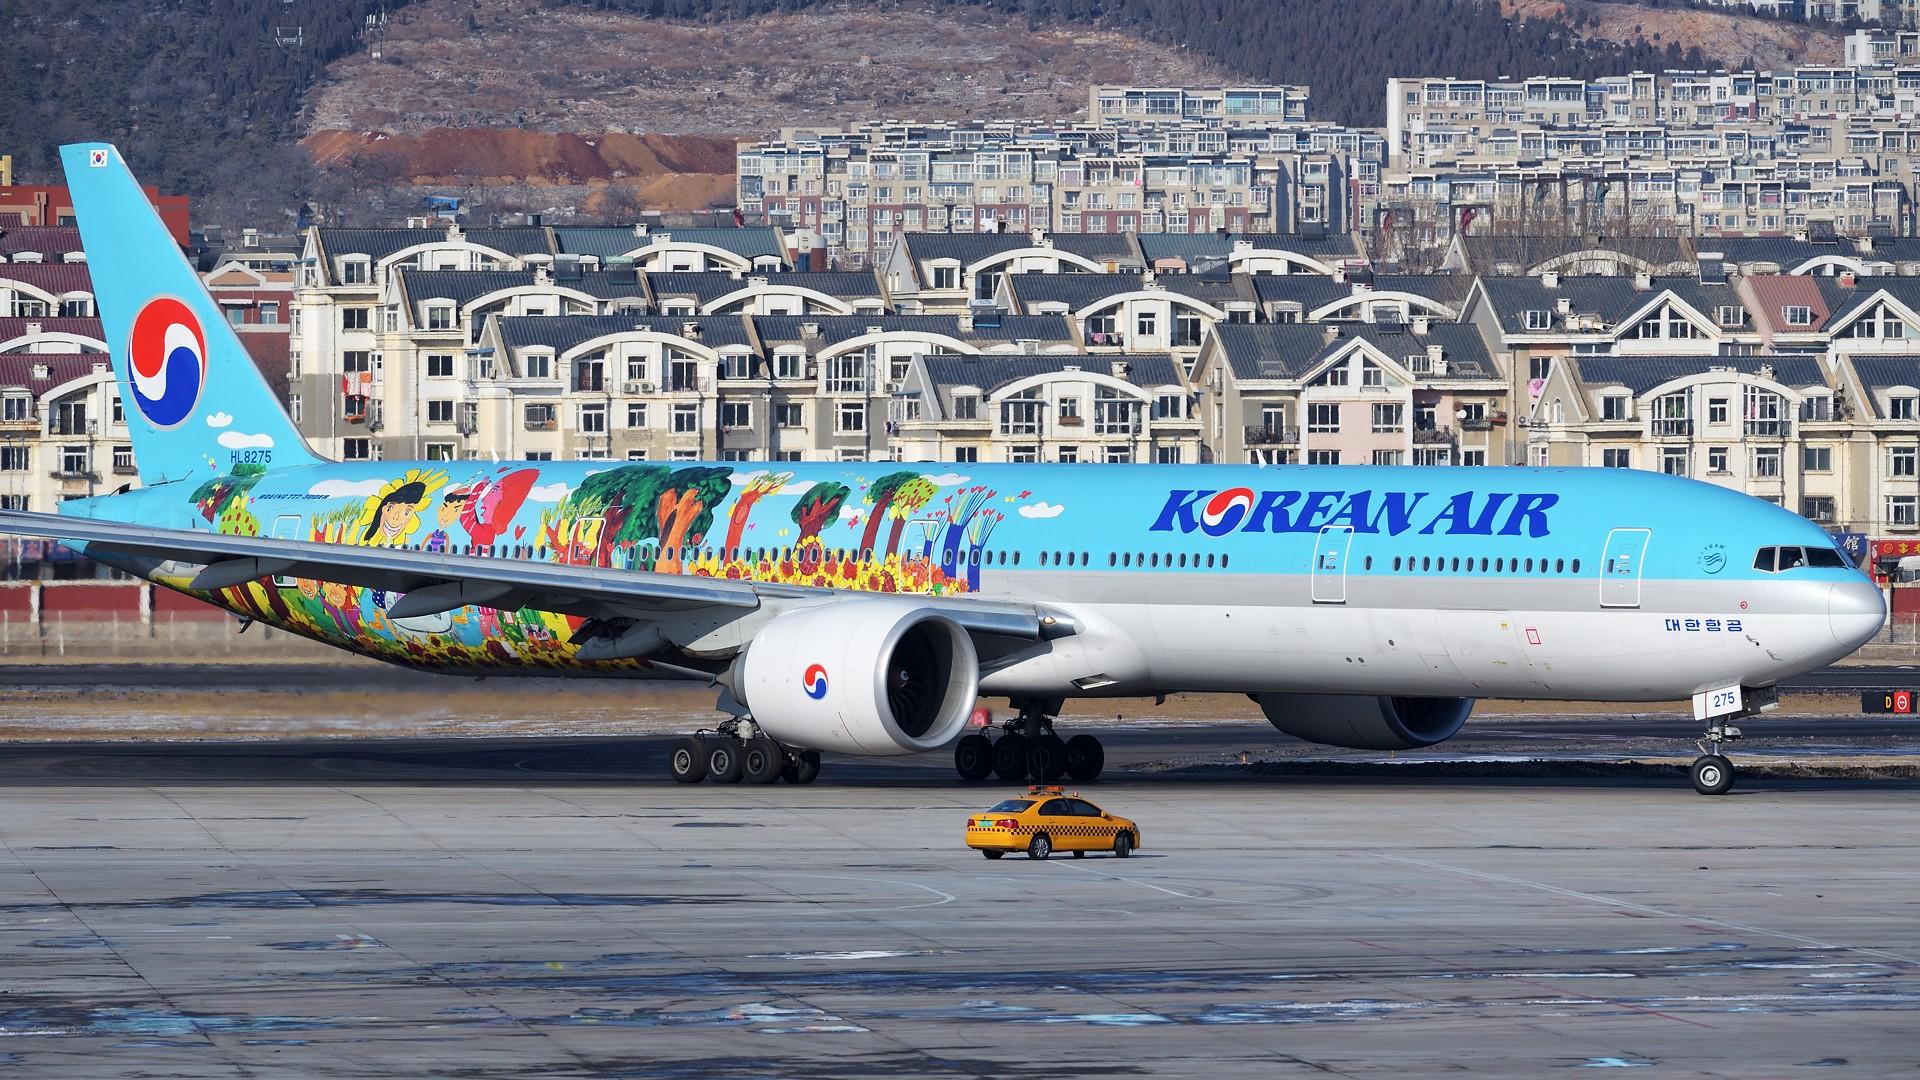 Re:[原创]★[DLC]一点有趣的事情(国庆加点儿料)★ BOEING 777-300ER HL8275 中国大连国际机场